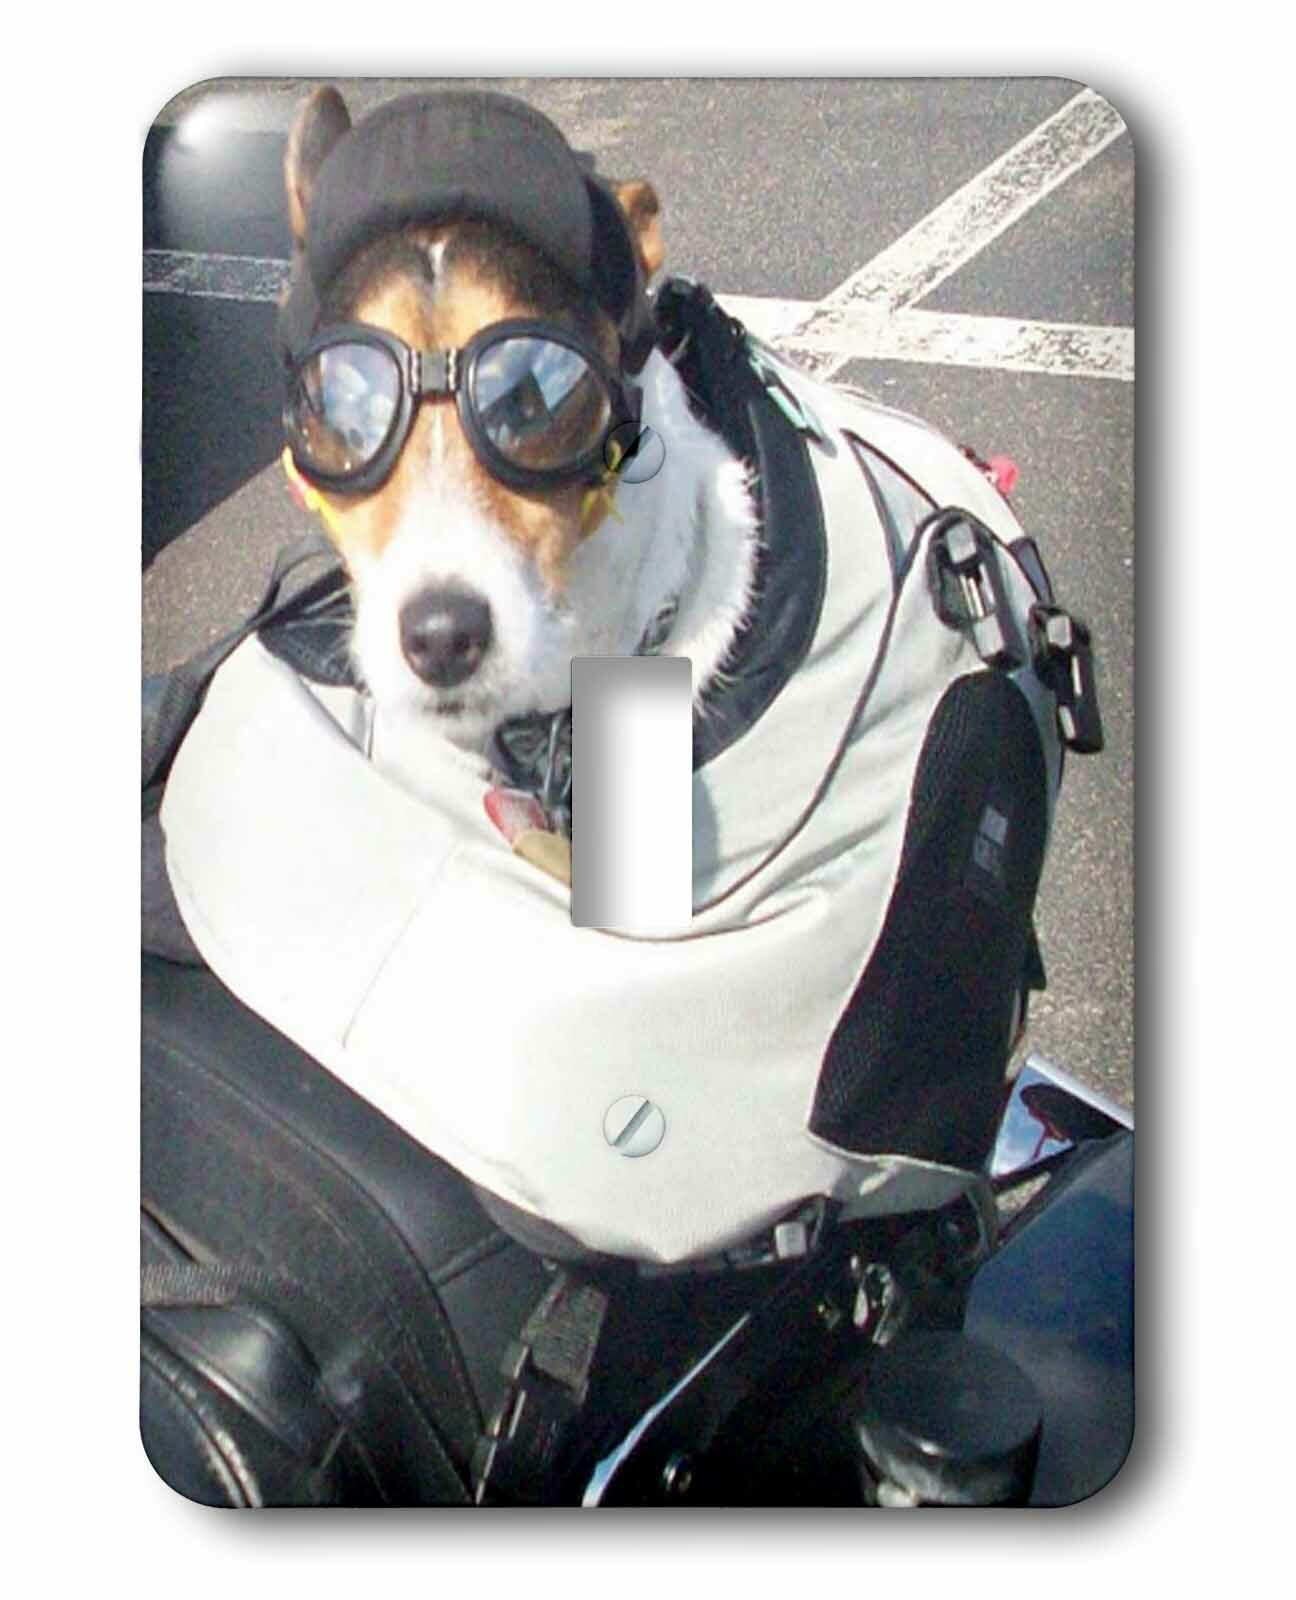 3drose Motorcycle Dog 1 Gang Toggle Light Switch Wall Plate Wayfair